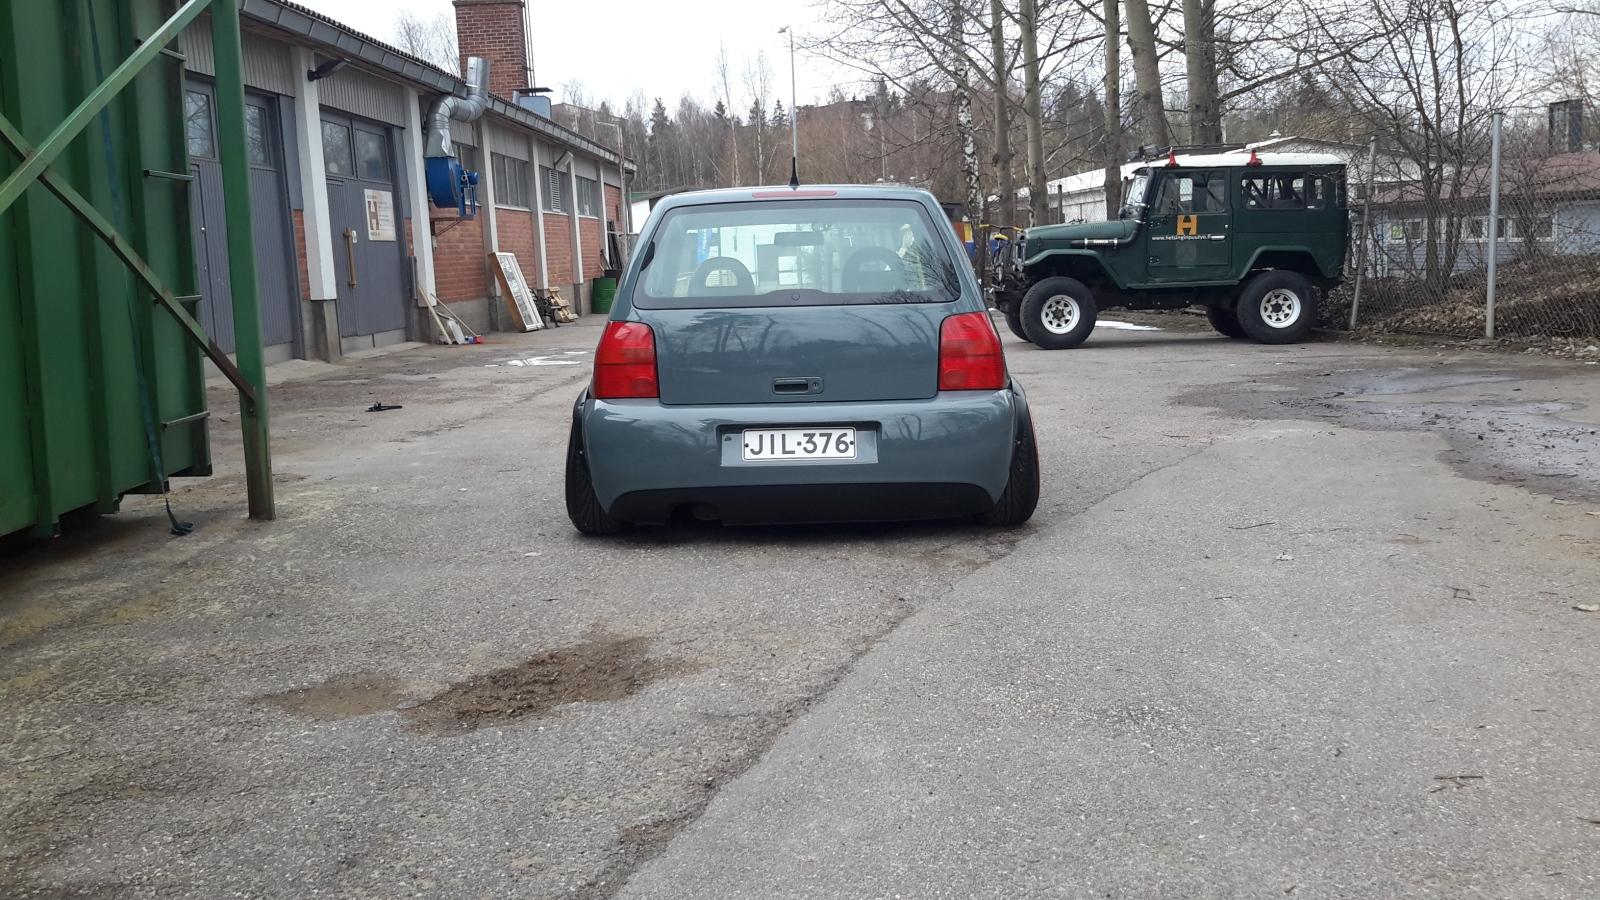 Wheelback: Baby Bender - Lupo - Sivu 6 Oi7jlx